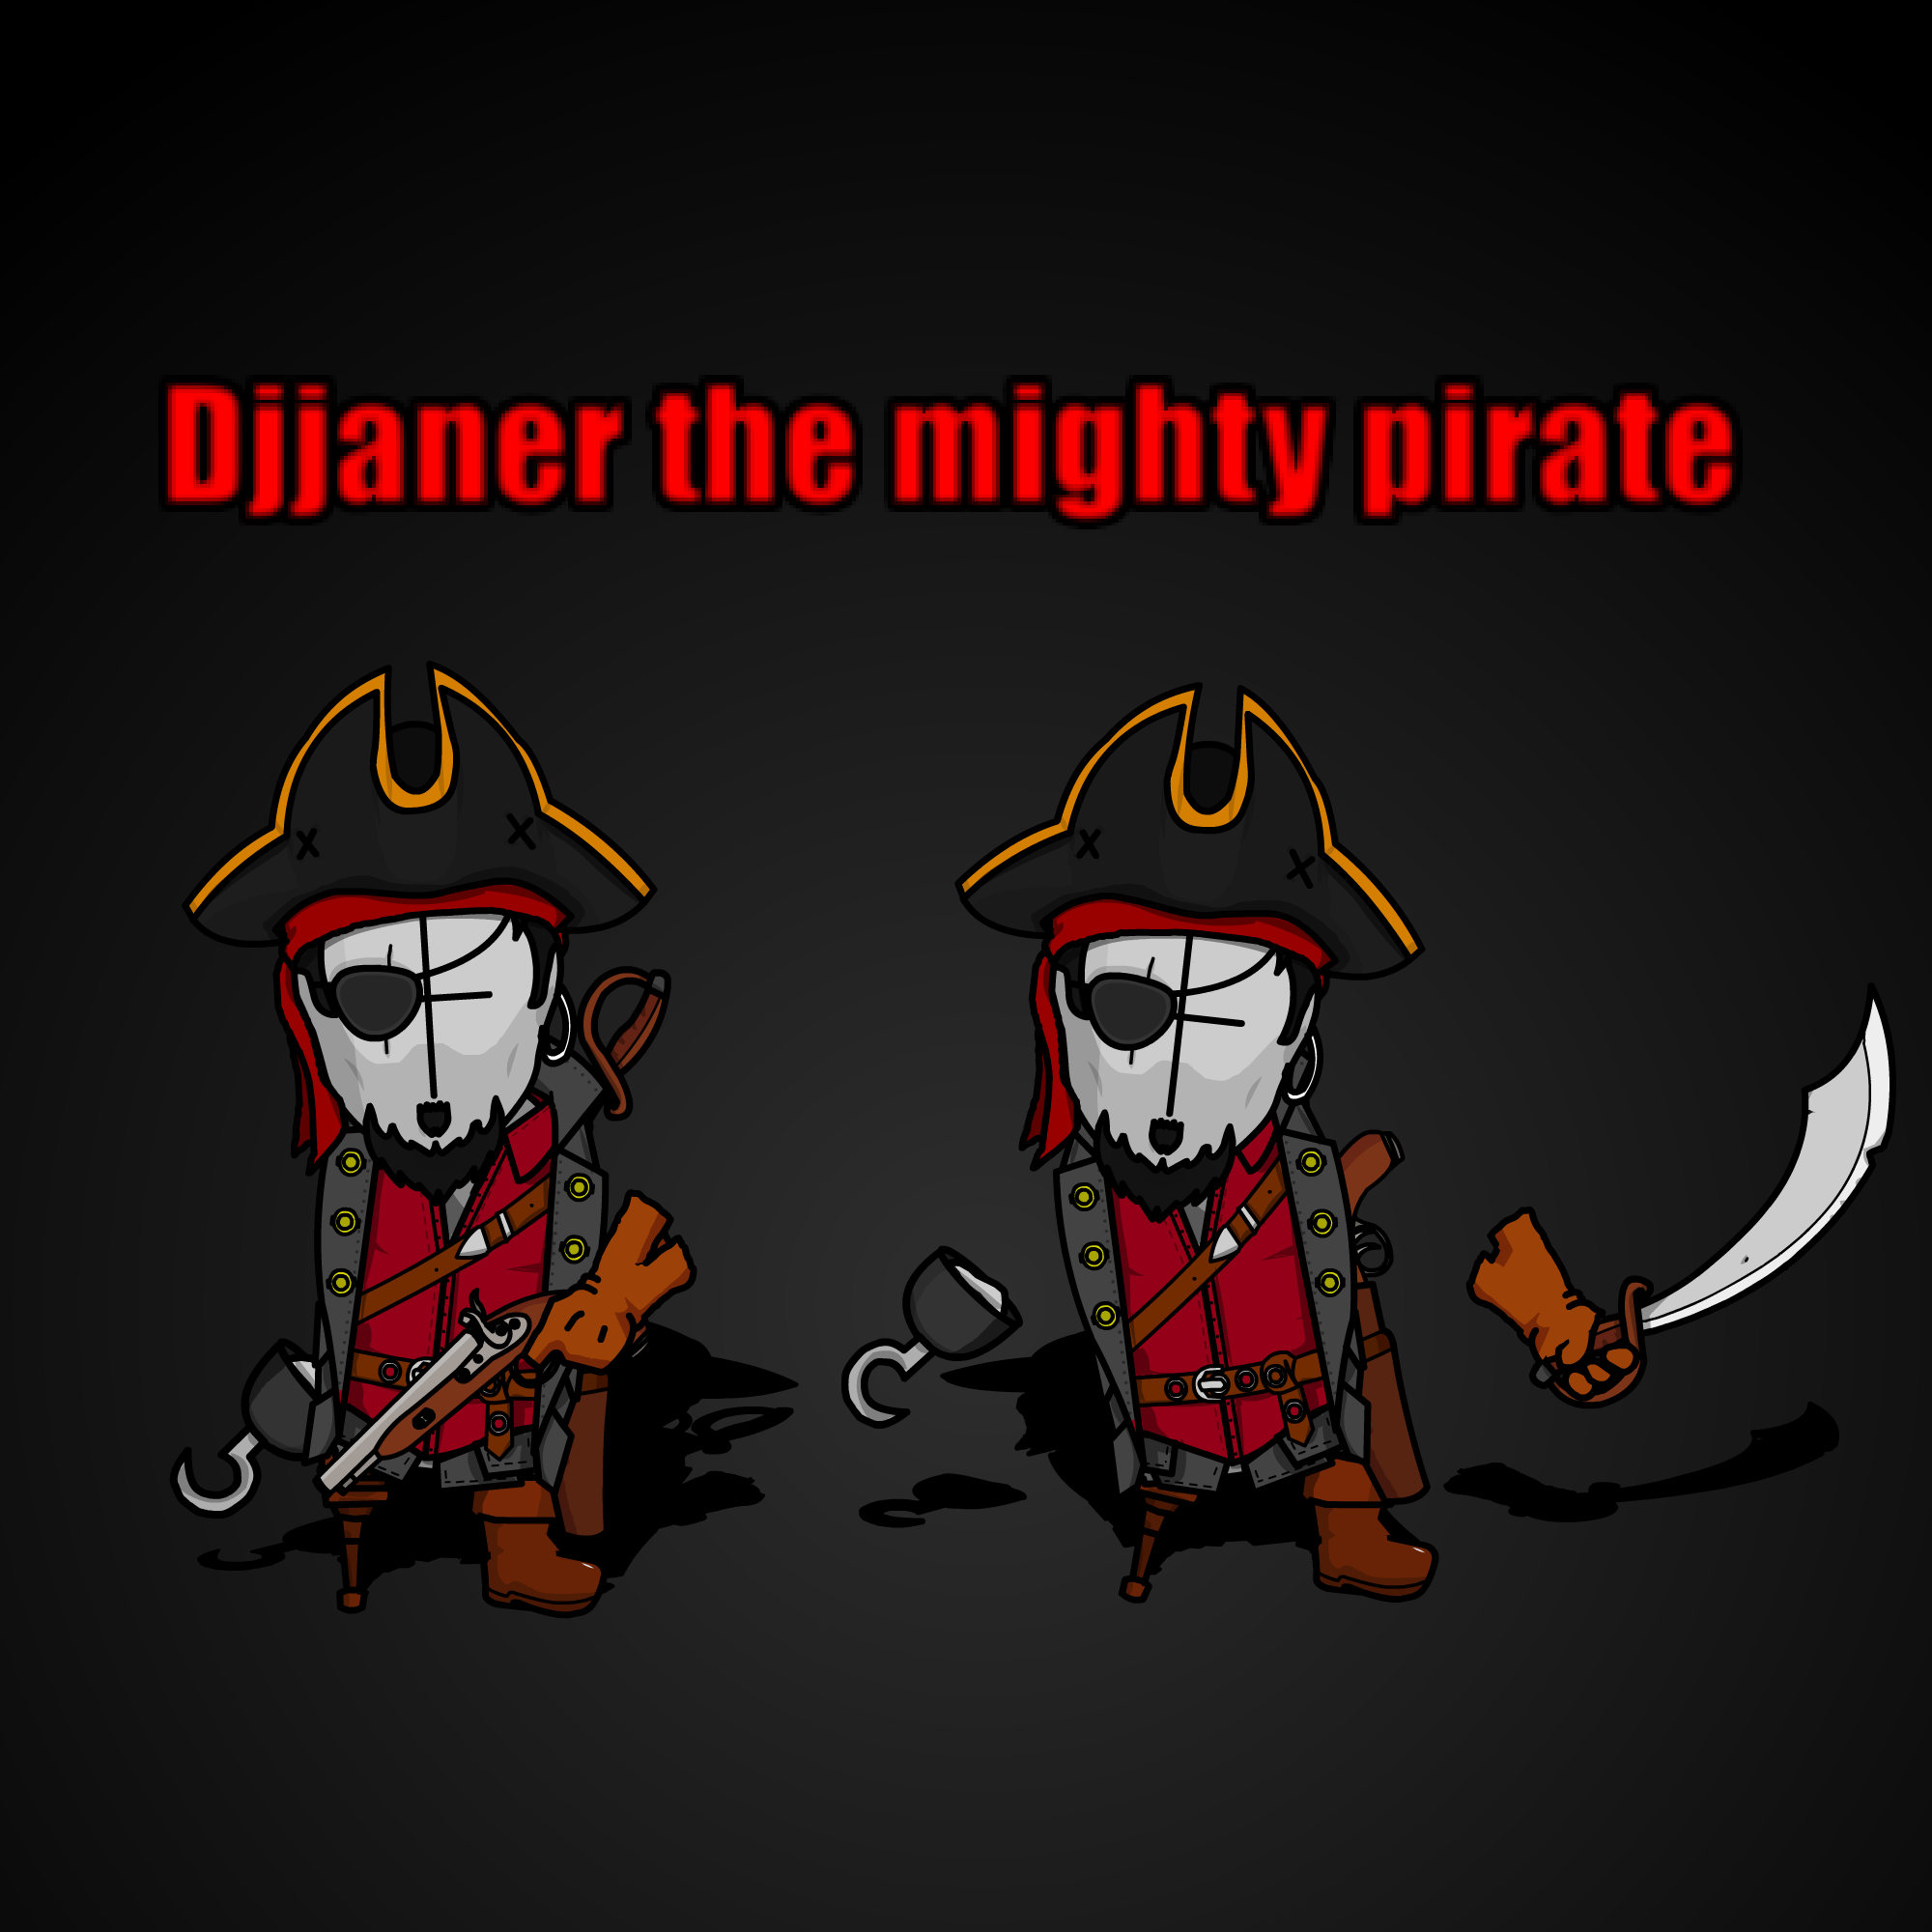 Djjaner the Mighty Pirate